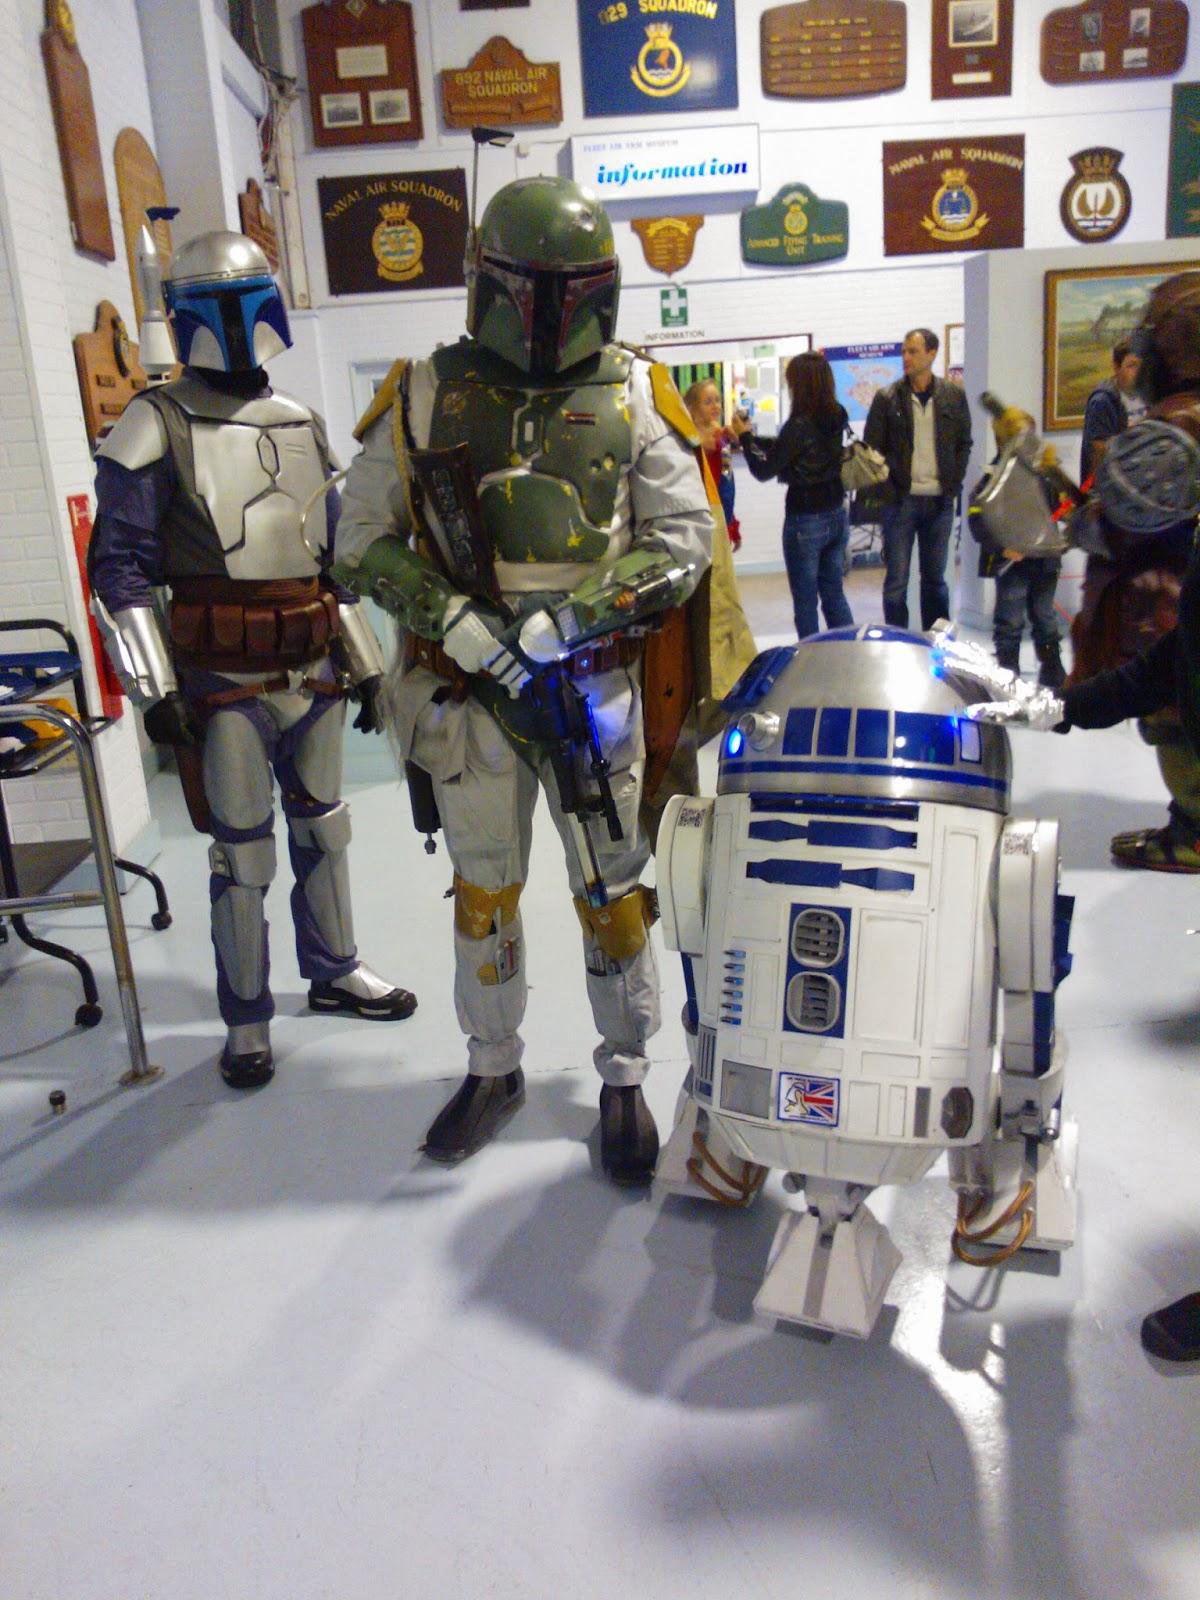 Jango Fett, Boba Fett & R2-D2